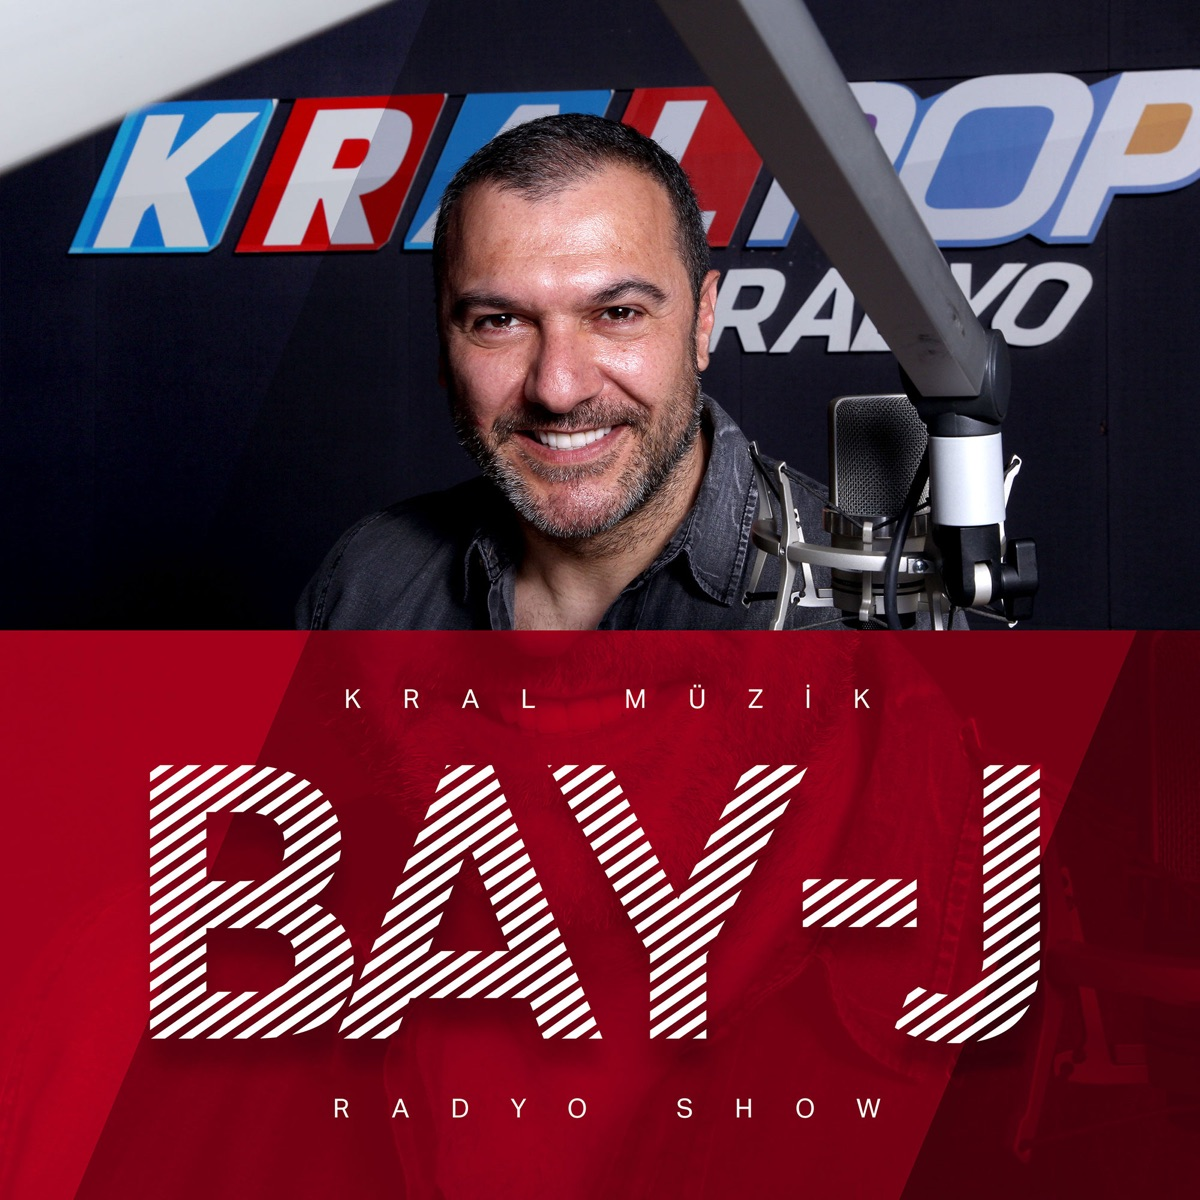 Bay J Show